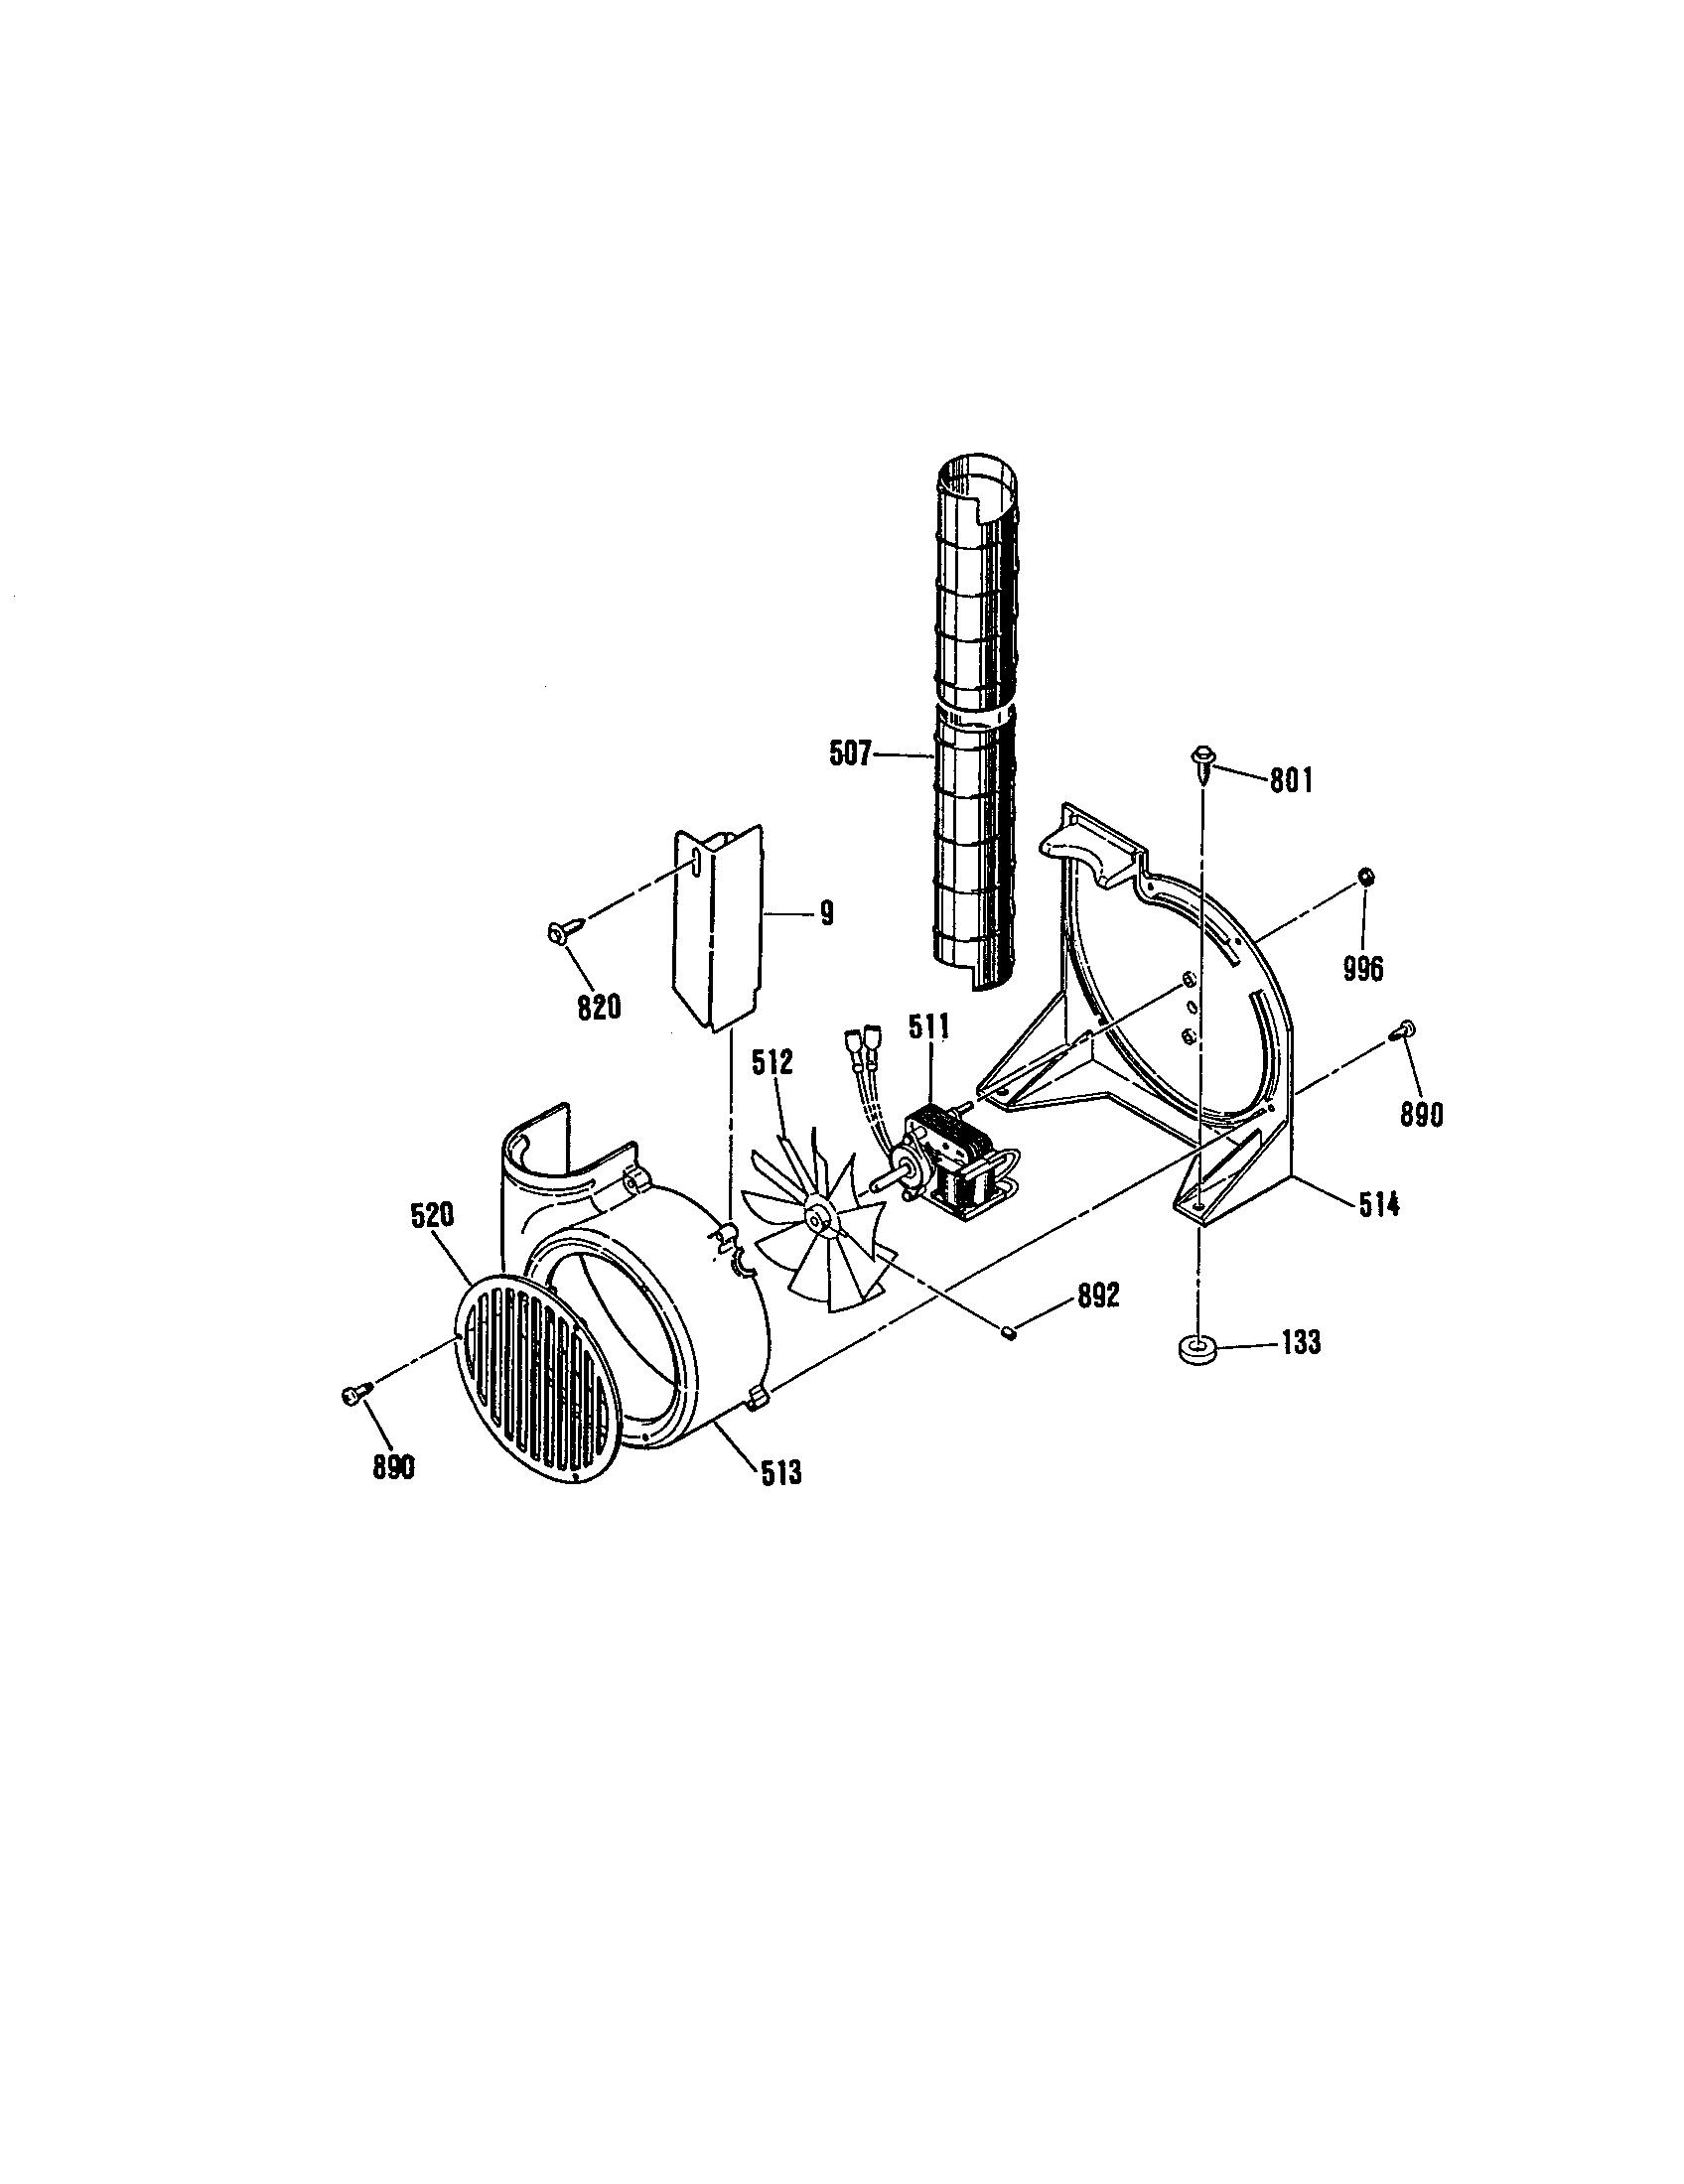 Ge Oven Wiring Diagram Jdp37 Manual E Books Jbp79sod1ss General Electric Jsp28gp Range Timer Stove Clocks And Appliance Timersjsp28gp Fan Blower Housing Parts